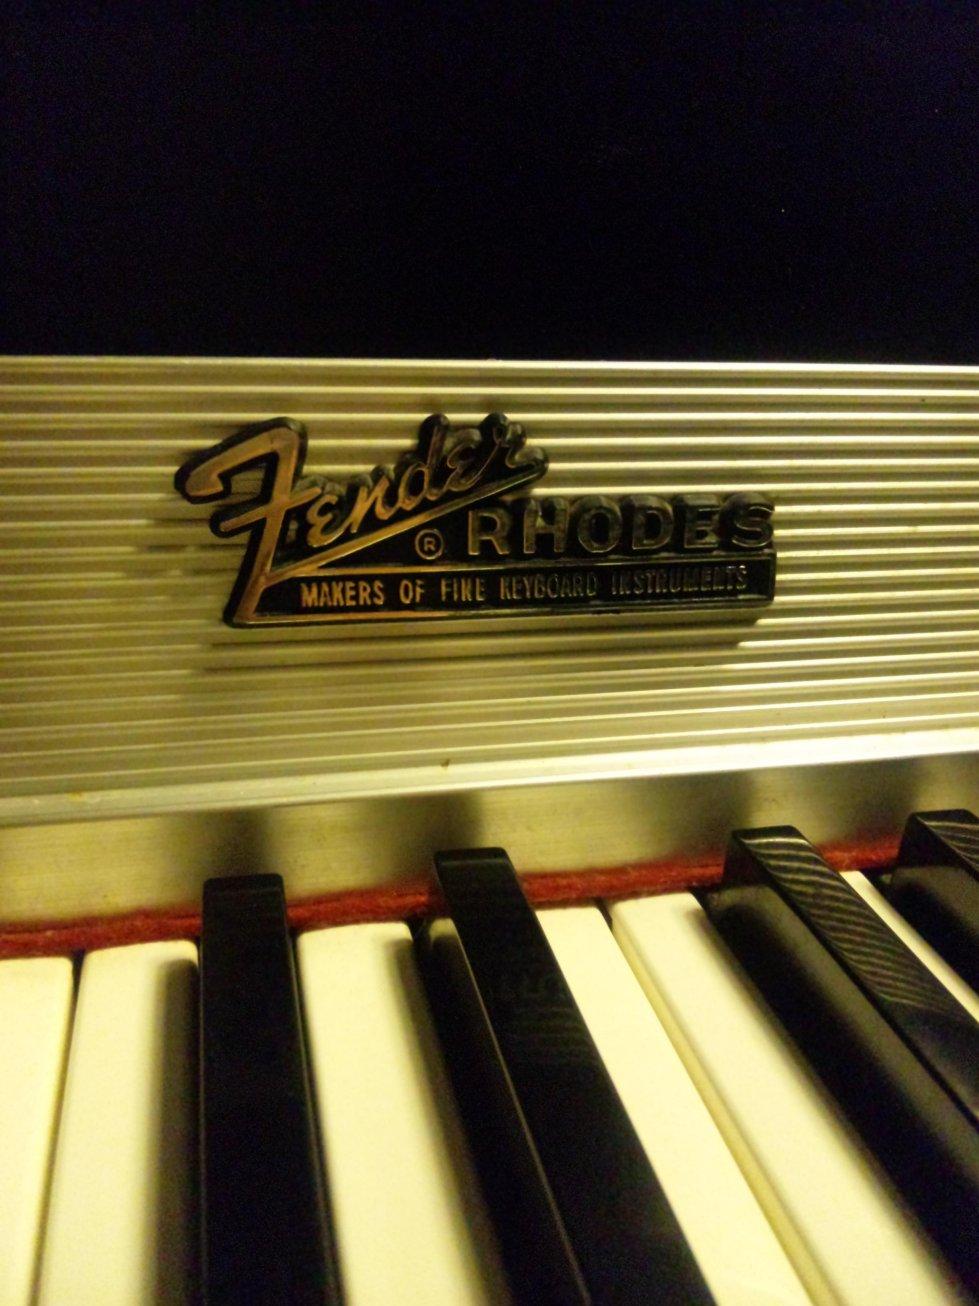 Fender Rhodes gazou 40%